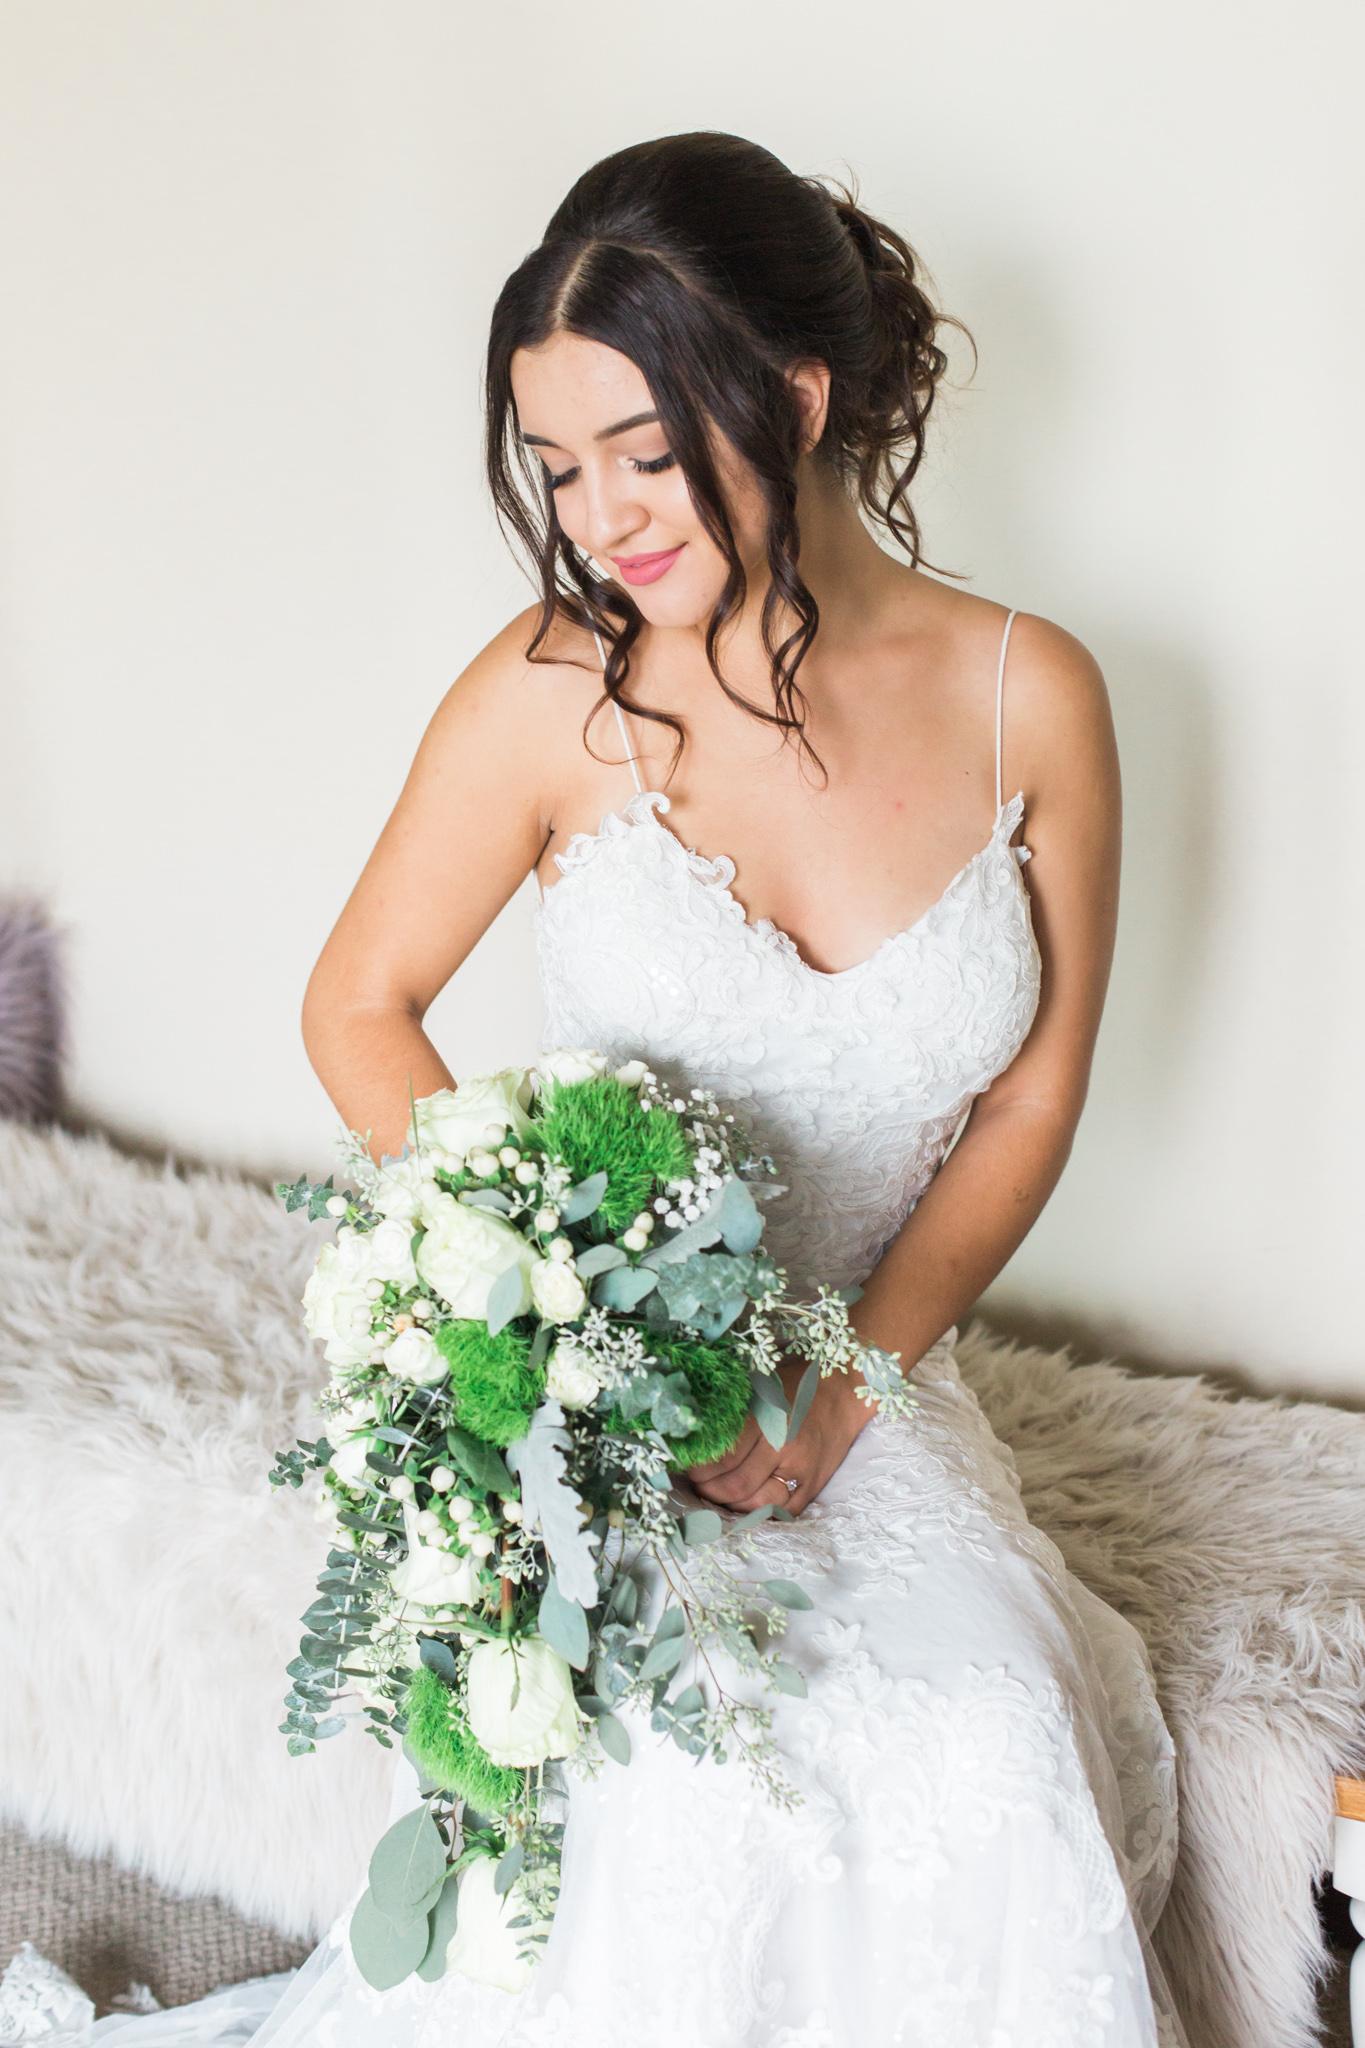 Olga_janni_wedding_090917_WEBSIZE (112 of 704).JPG